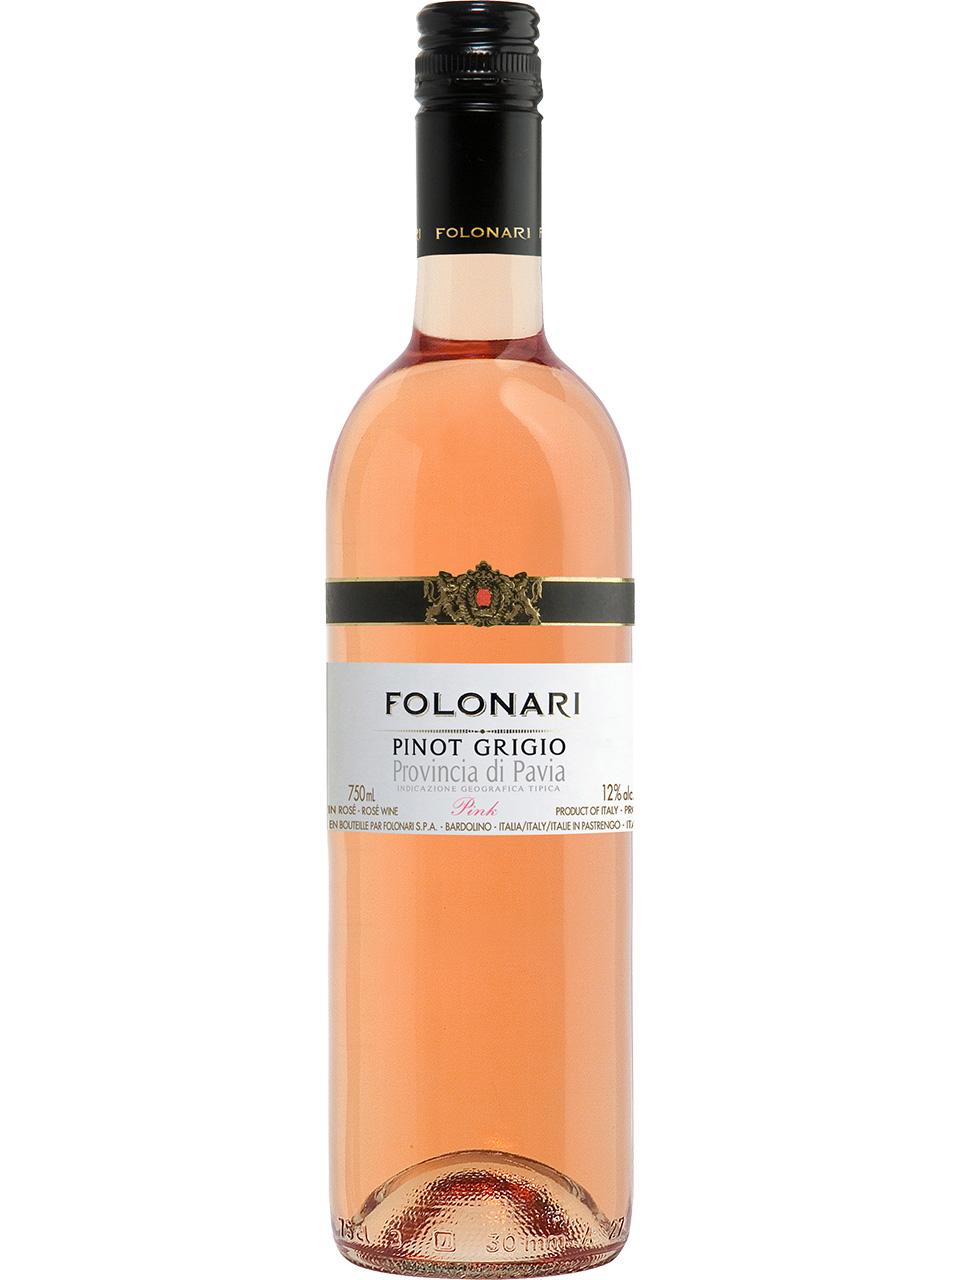 Folonari Pink Pinot Grigio